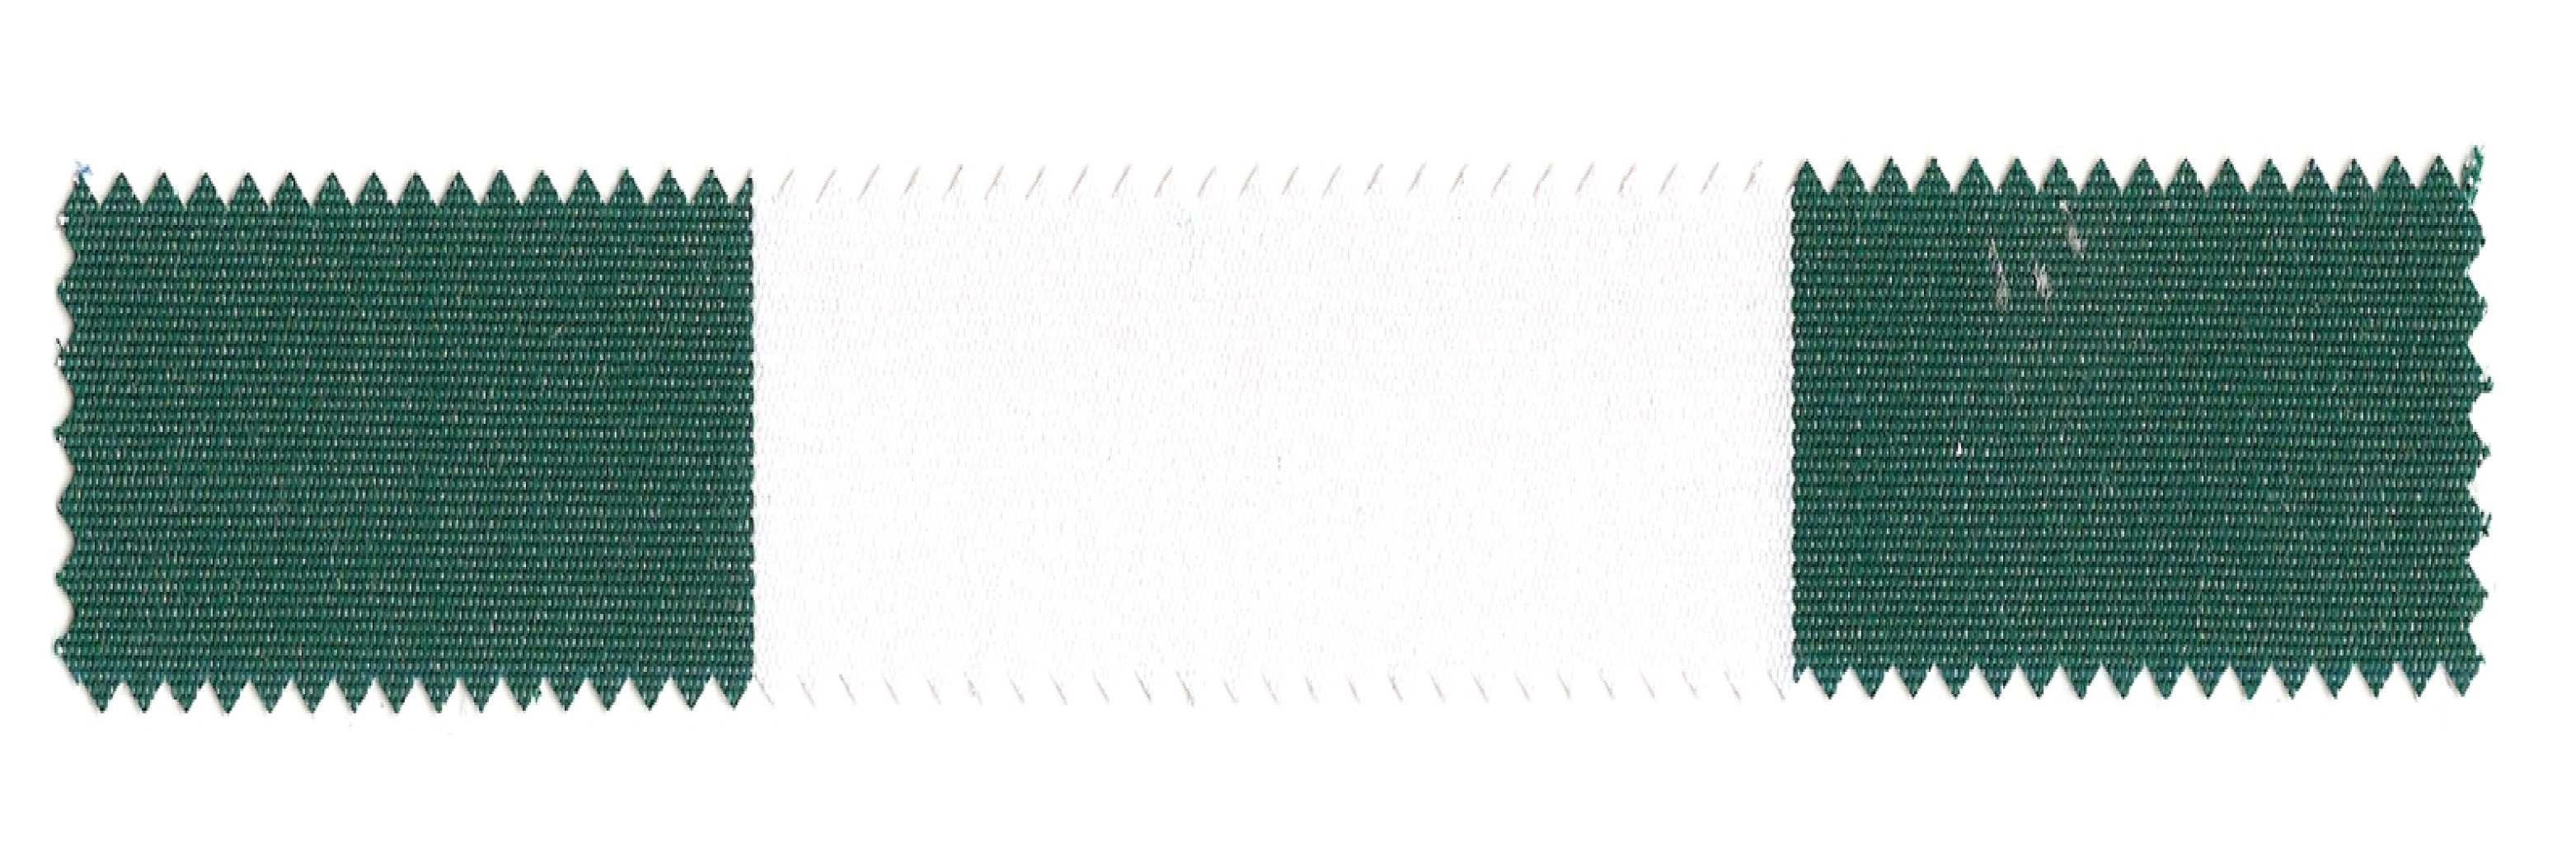 SATTLER ELEMENTS BLOCK STRIPES Green-White